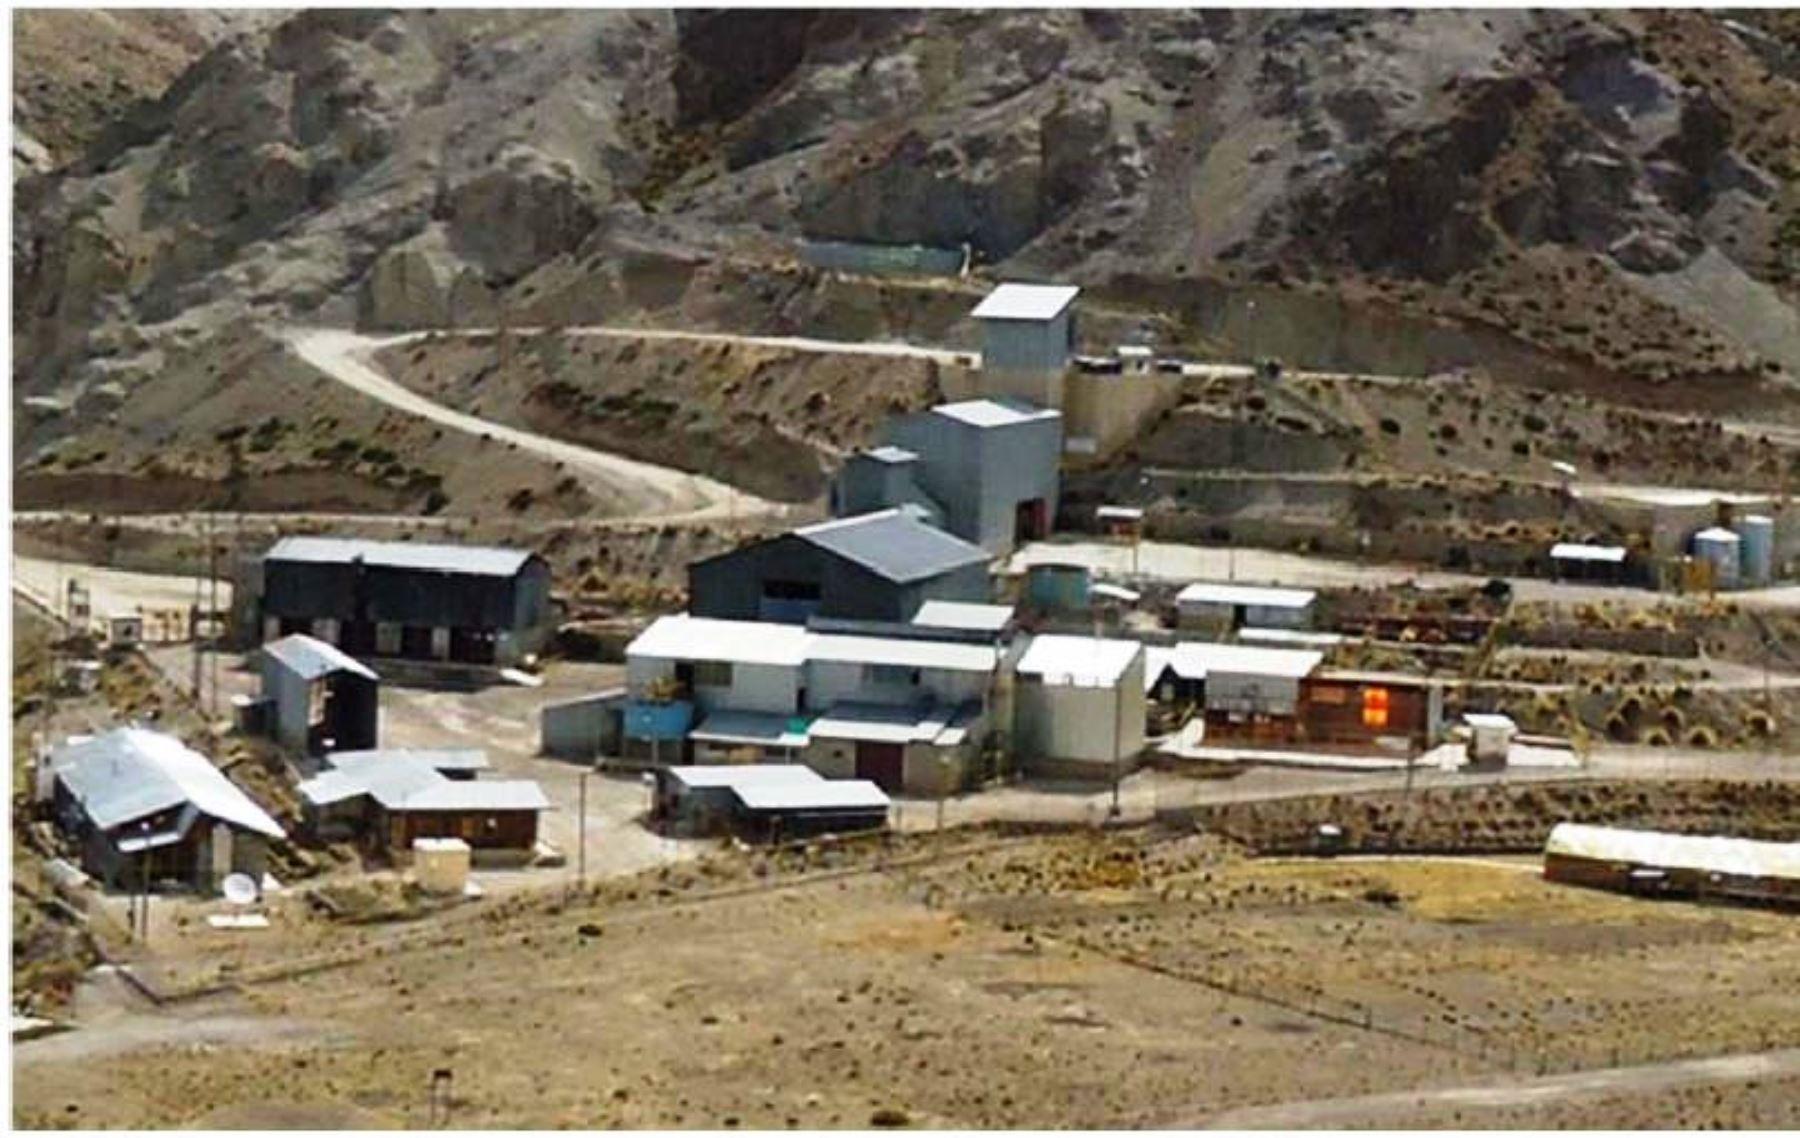 Osinergmin envió equipo para supervisar derrame de relaves en mina Shila, ubicada en distrito de Chachas, provincia de Castilla, región Arequipa. FOTO: INTERNET